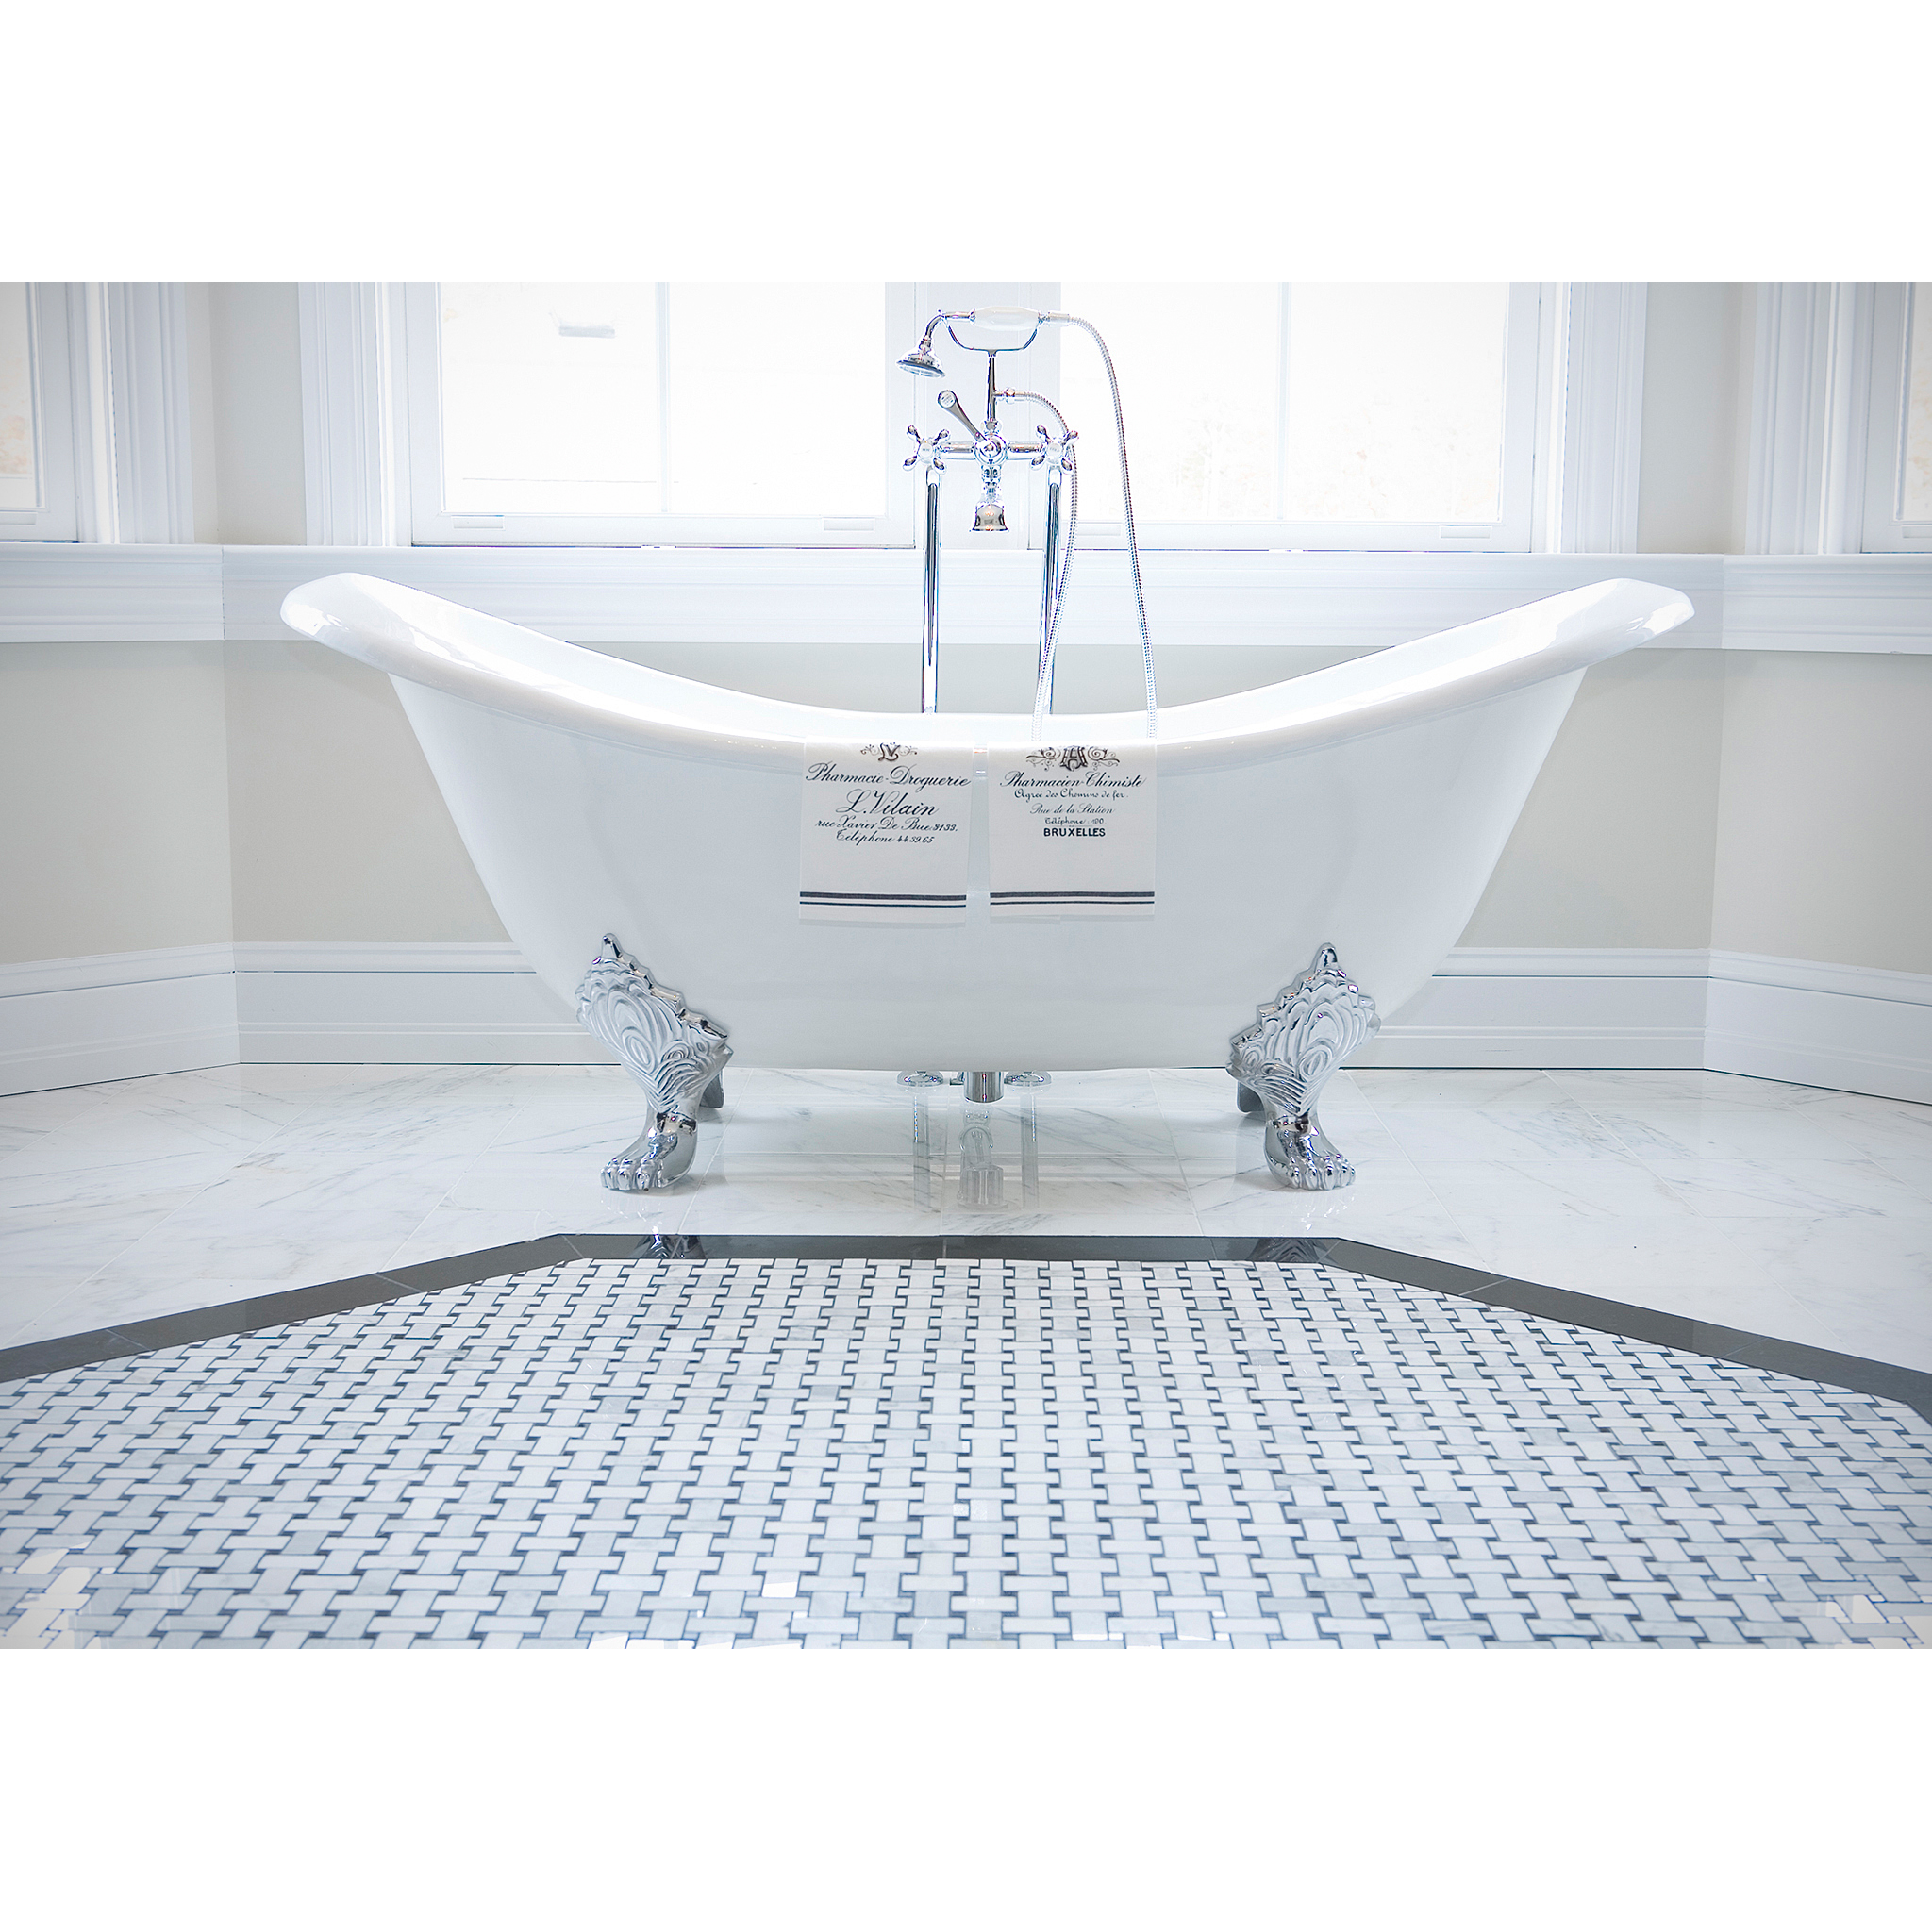 Product shot of clawfoot bathtub by Craig Anderson